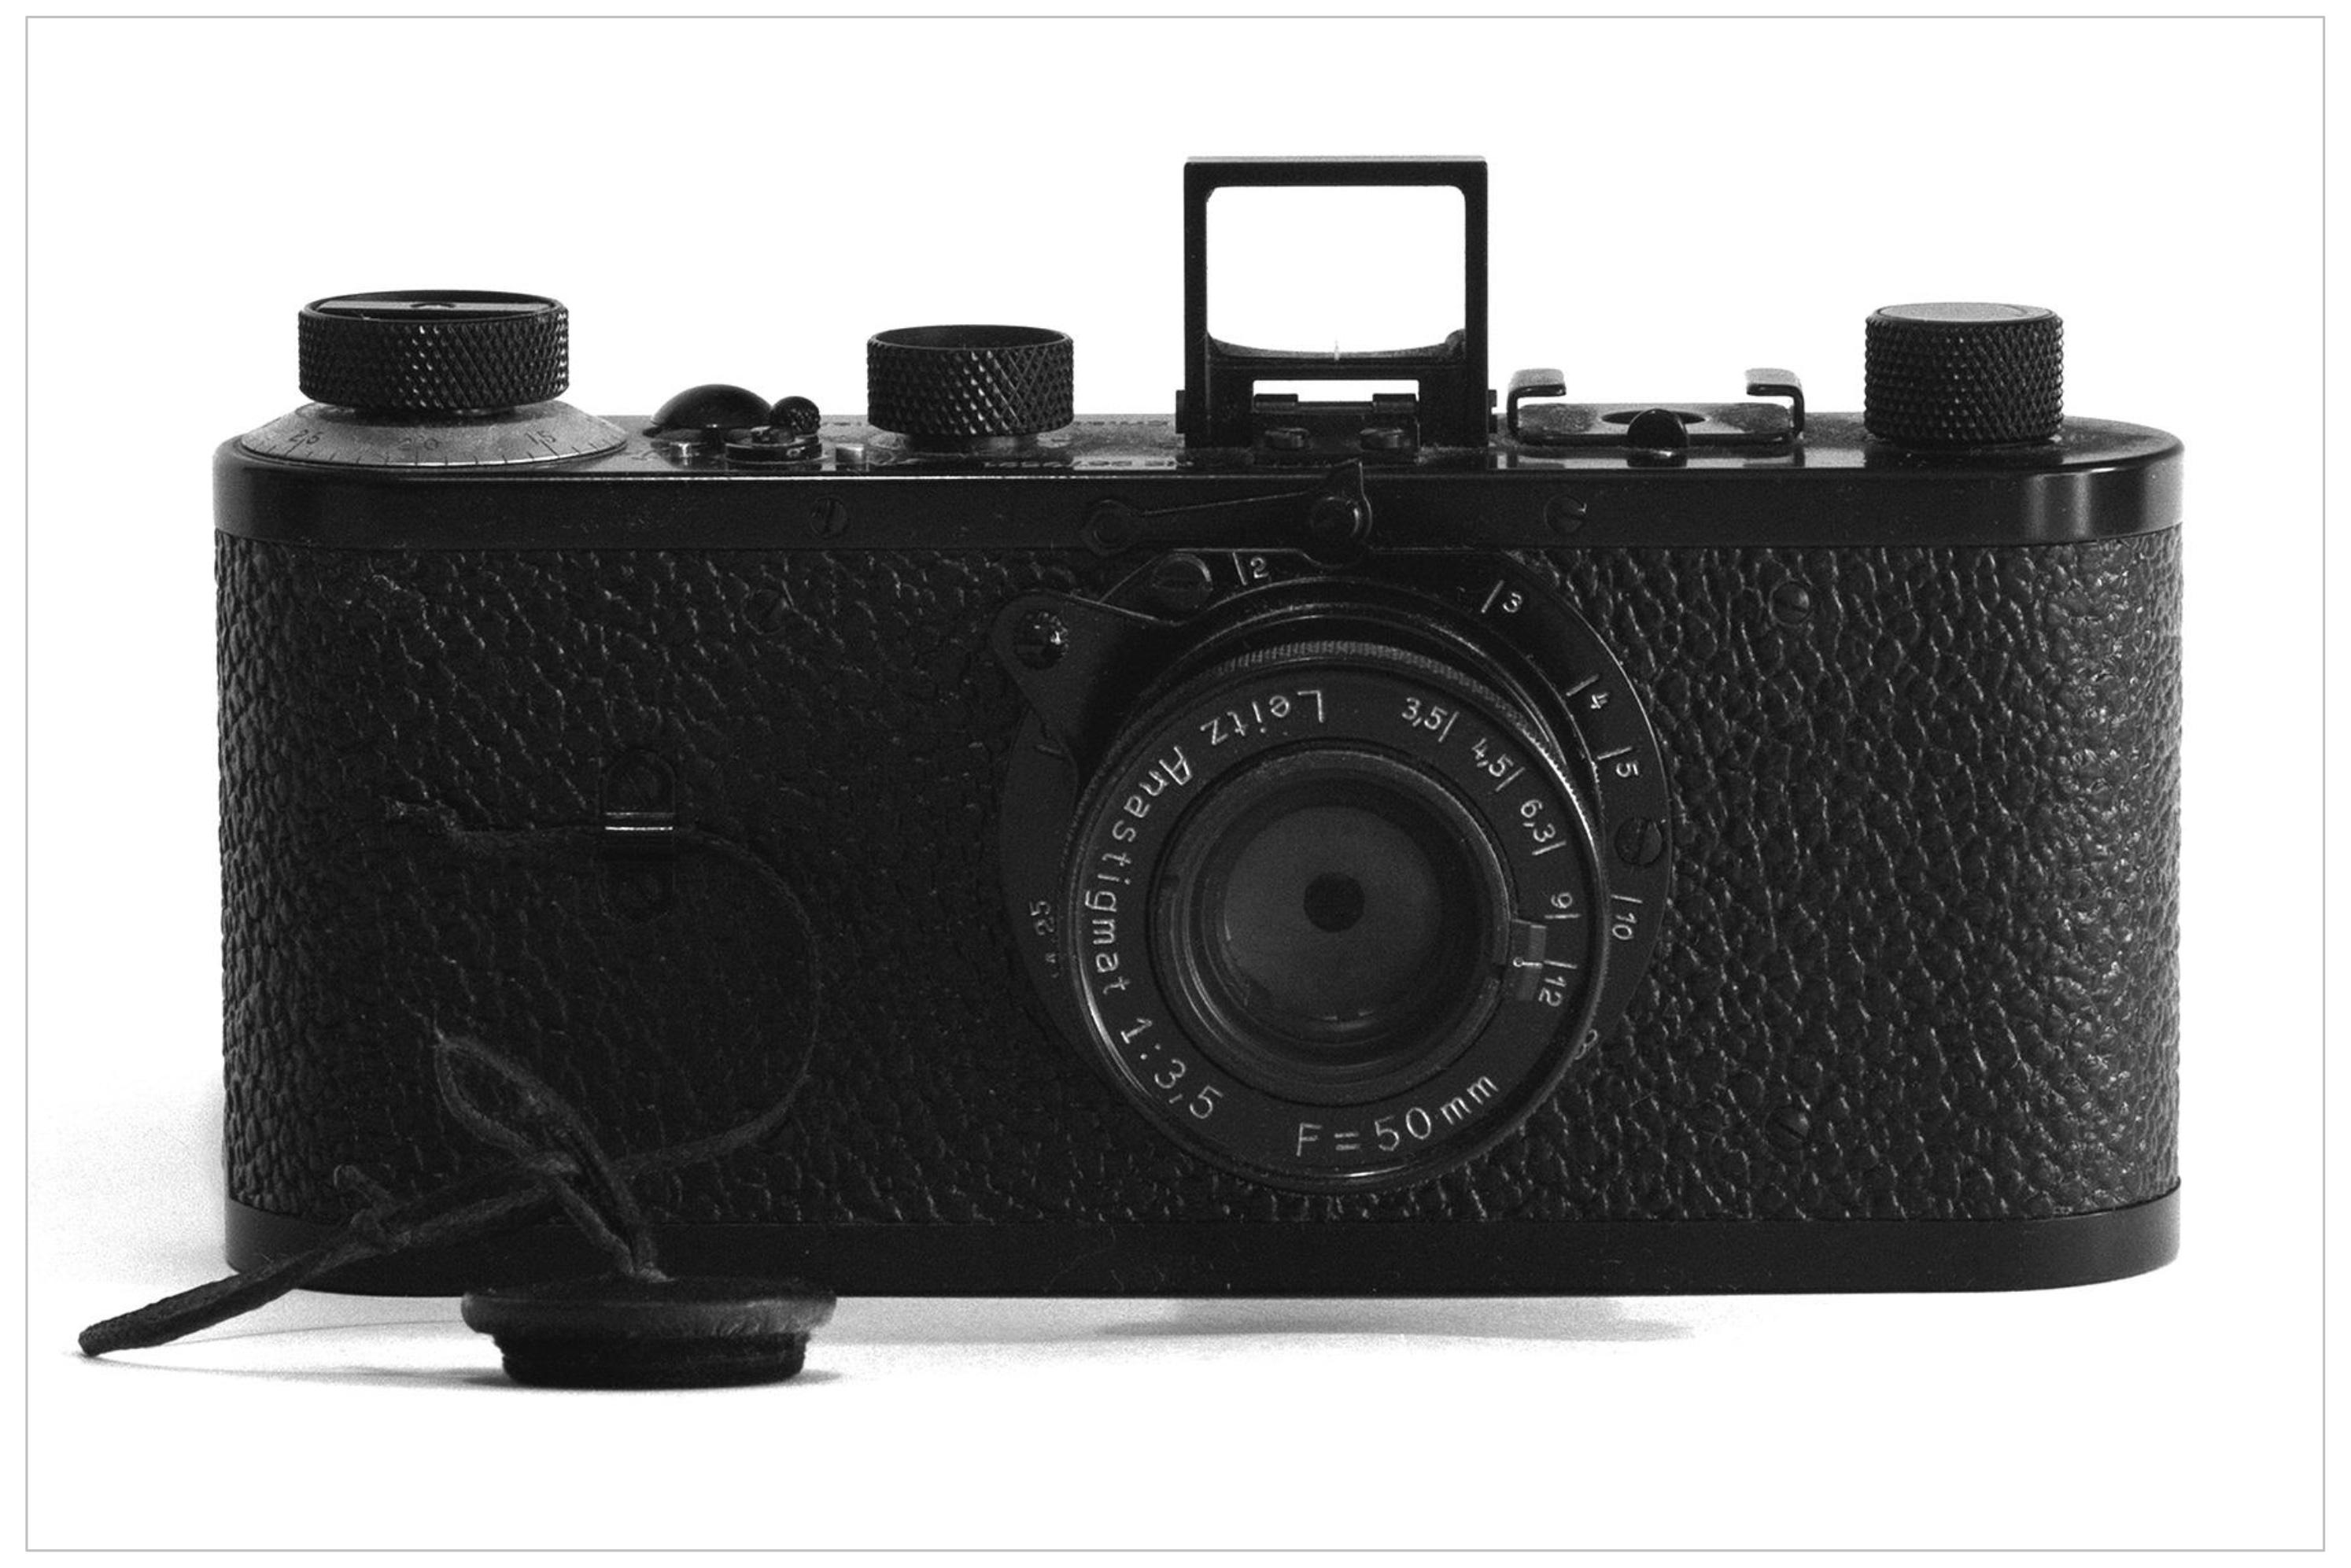 Leica Iii Entfernungsmesser : Leica mania karine nowak fotograf